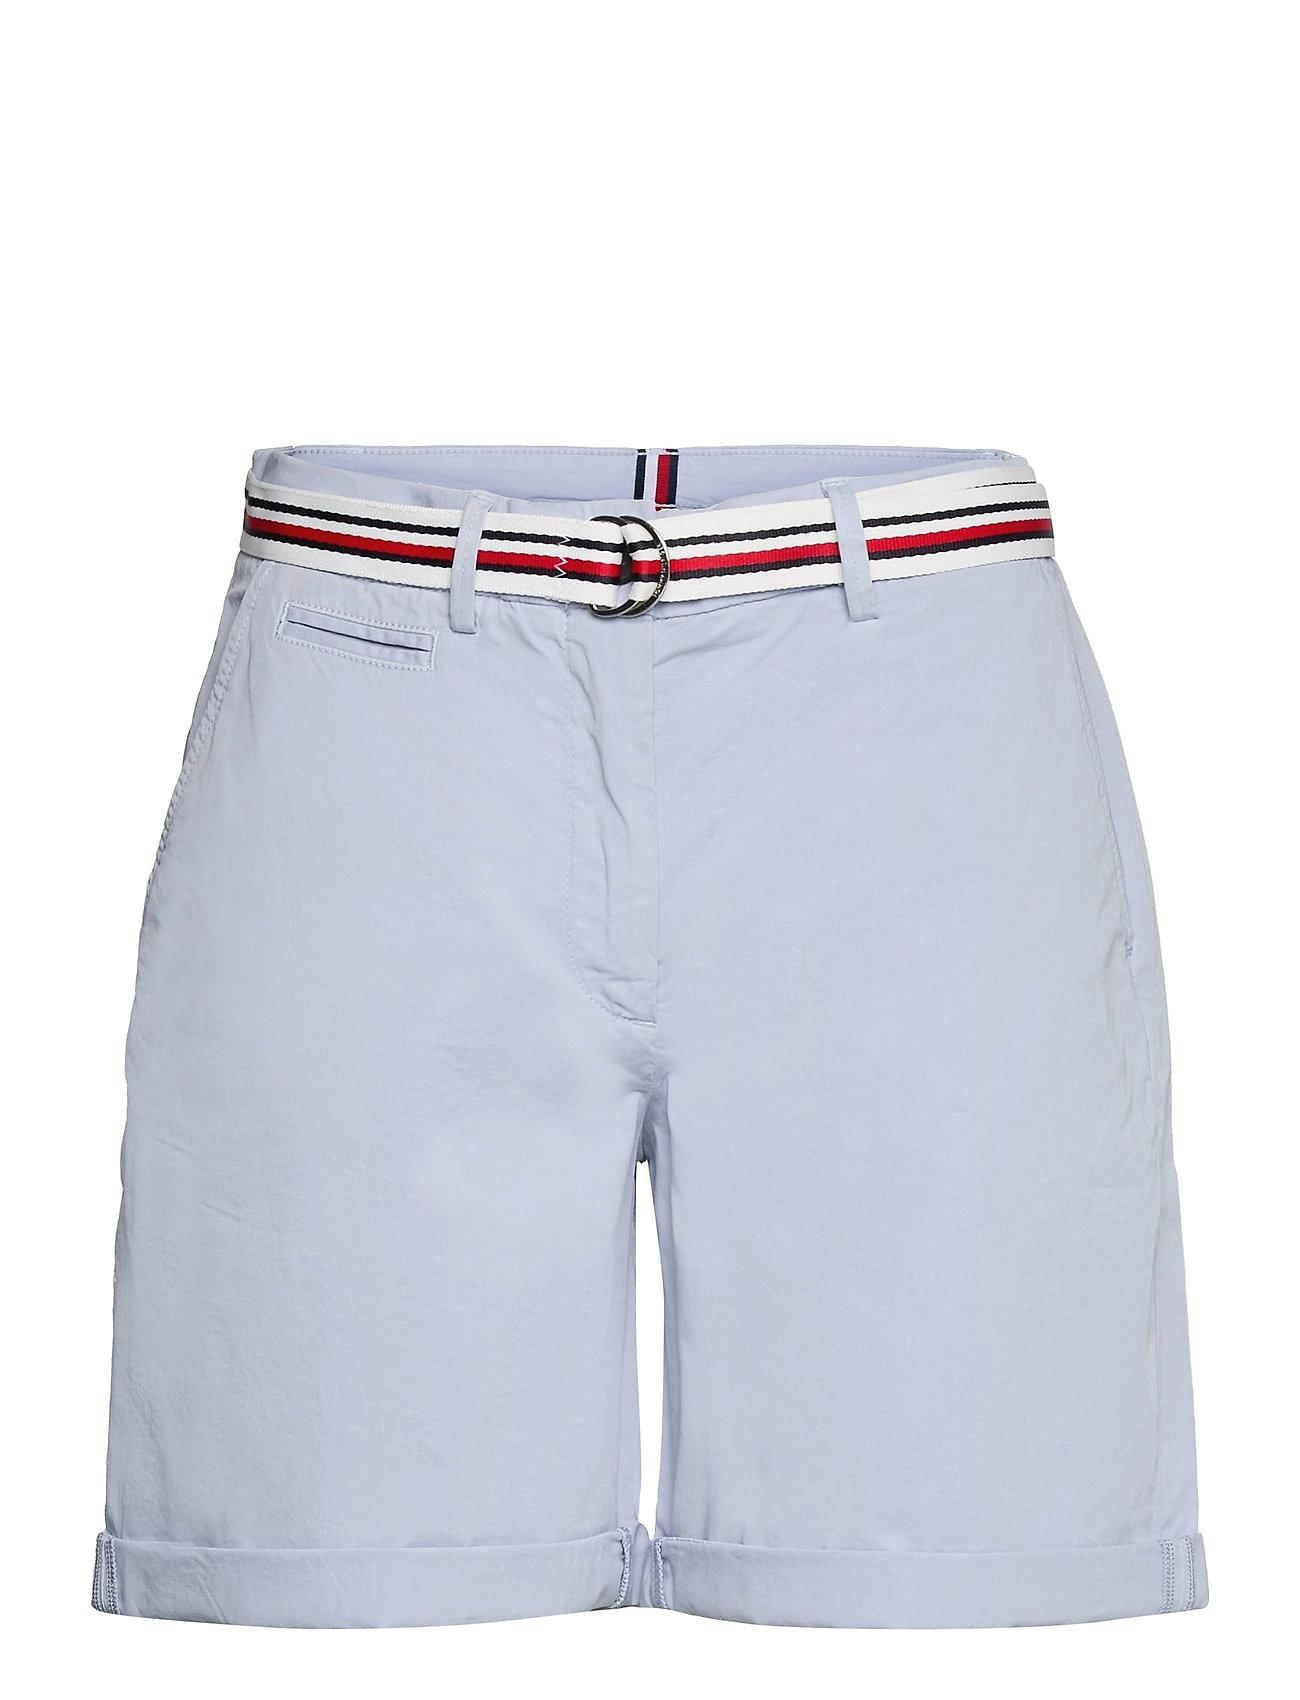 Image of Cotton Tencel Chino Rw Short Shorts Chino Shorts Blå Tommy Hilfiger (3534656159)